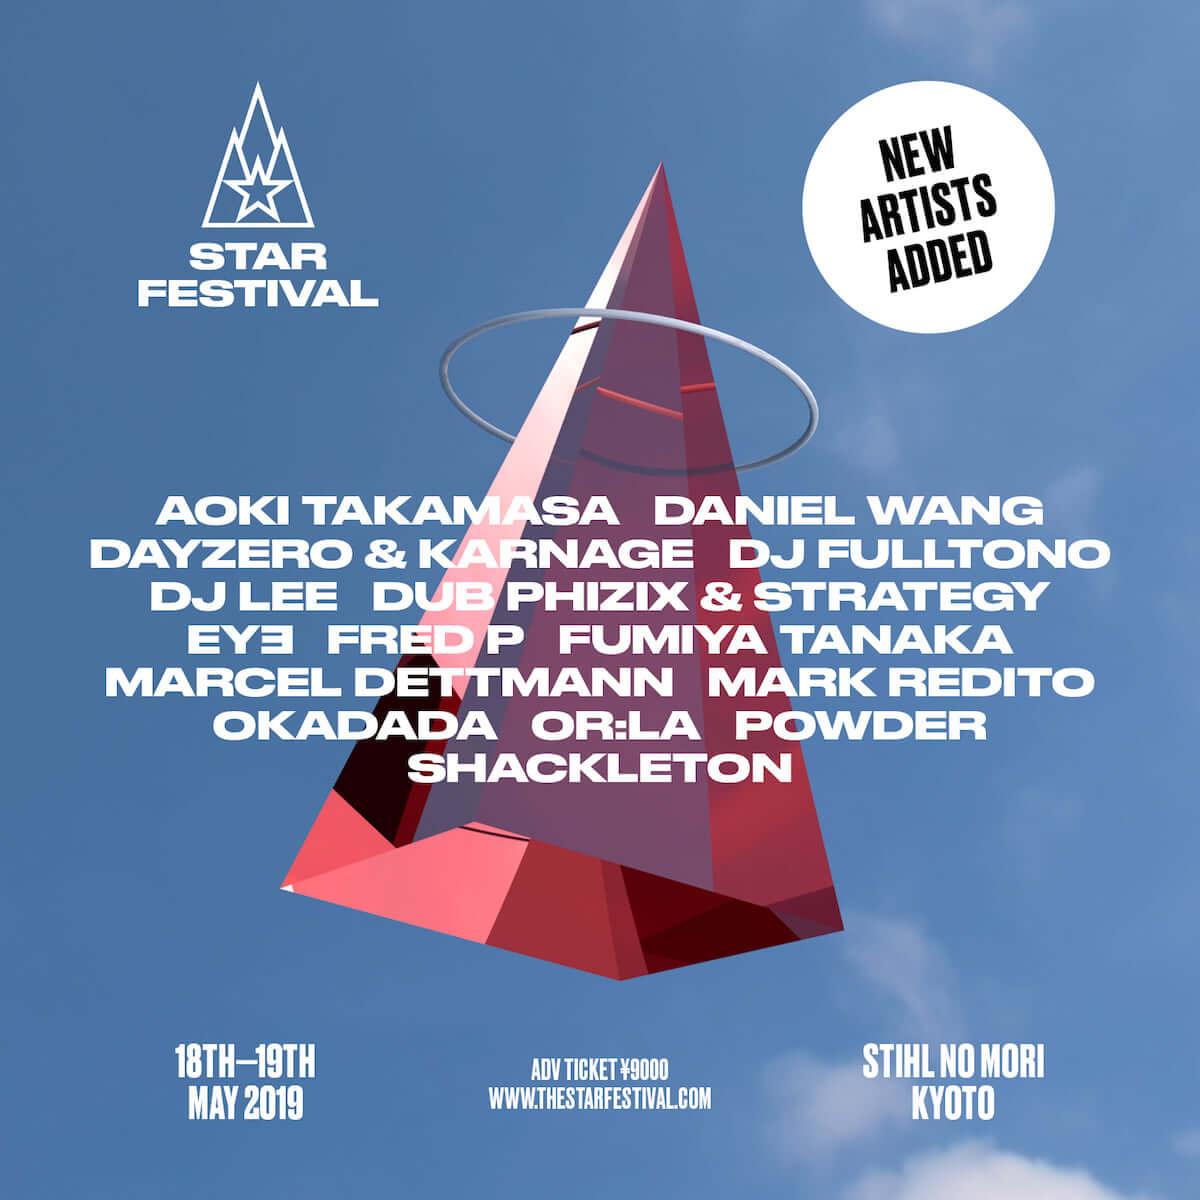 <THE STAR FESTIVAL 2019>第3弾出演アーティスト発表!Fred P、DJ Fulltonoら4組追加 music190412_thestarfestival_main-1200x1200